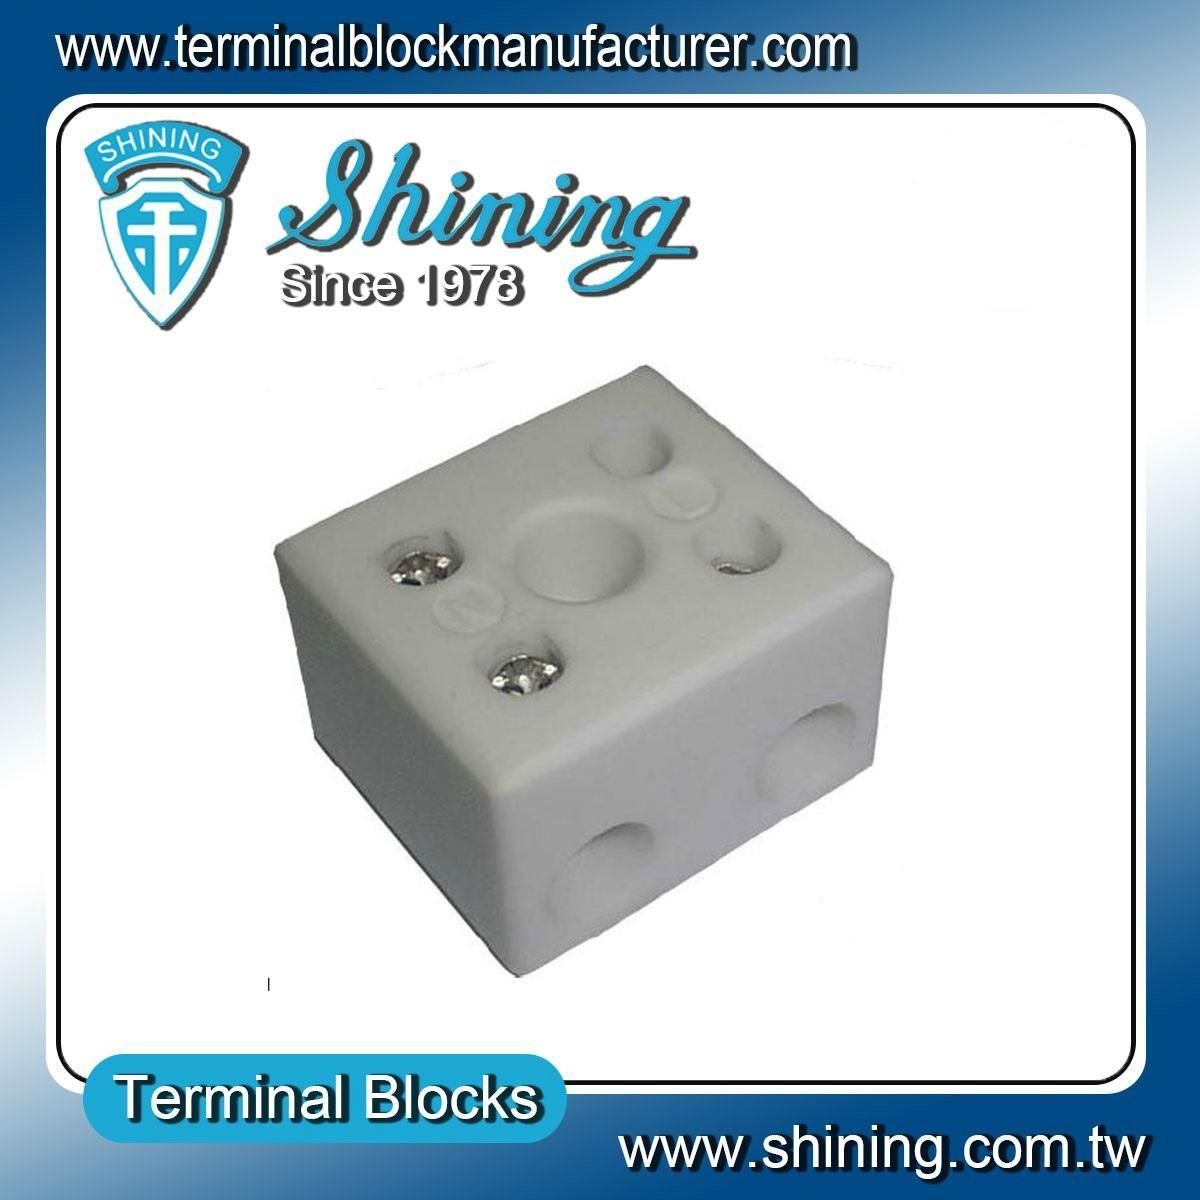 TC-652-A 陶瓷端子台 Ceramic Terminal Block 1